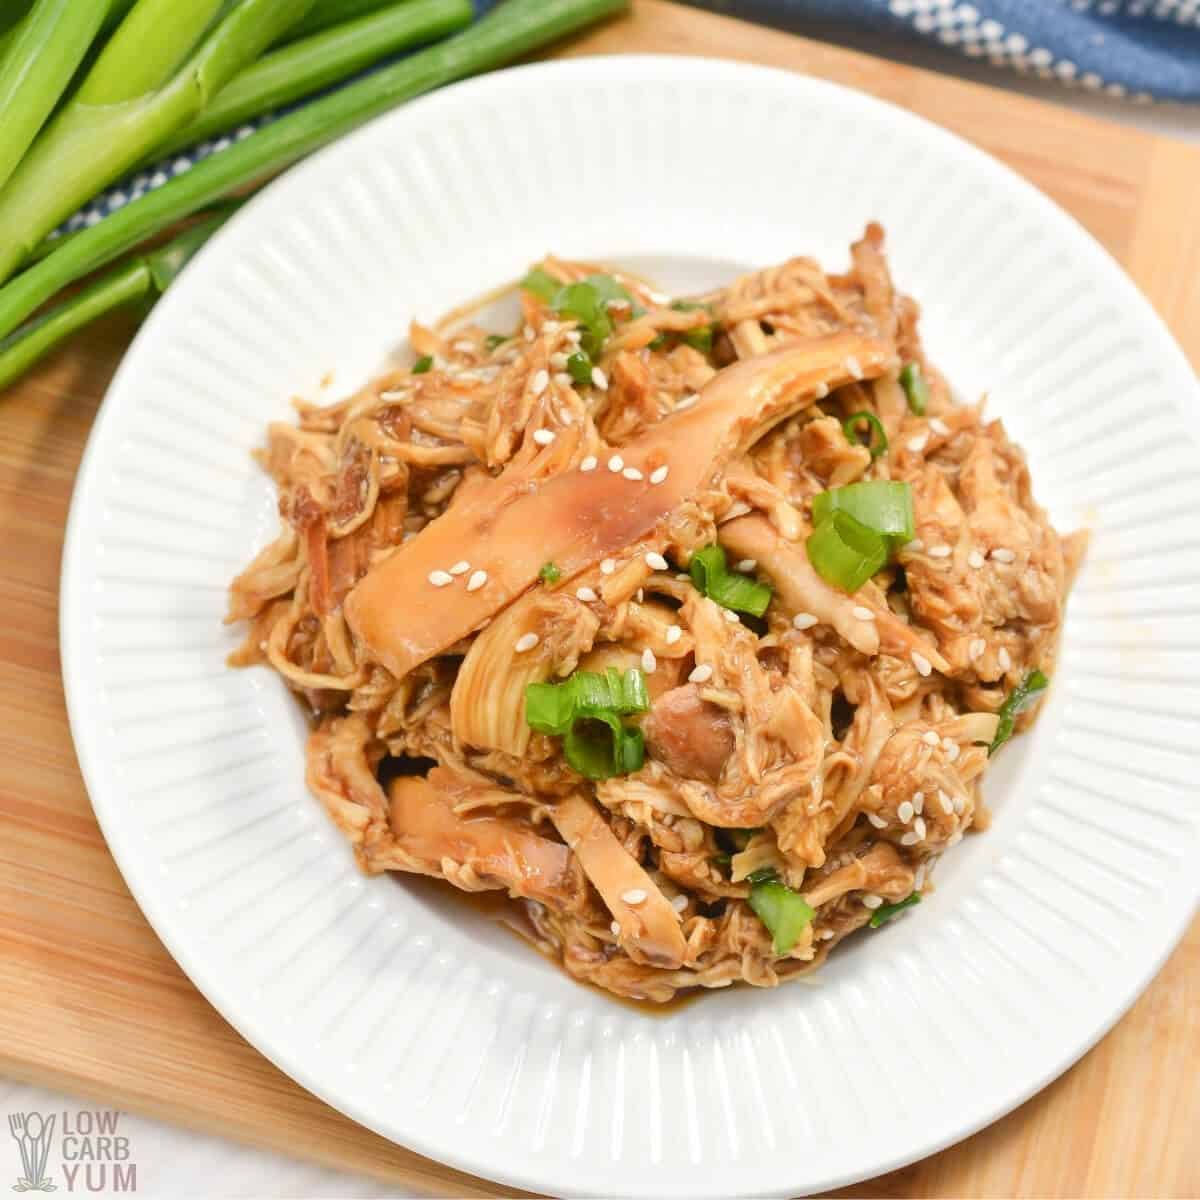 shredded crock pot teriyaki chicken featured image